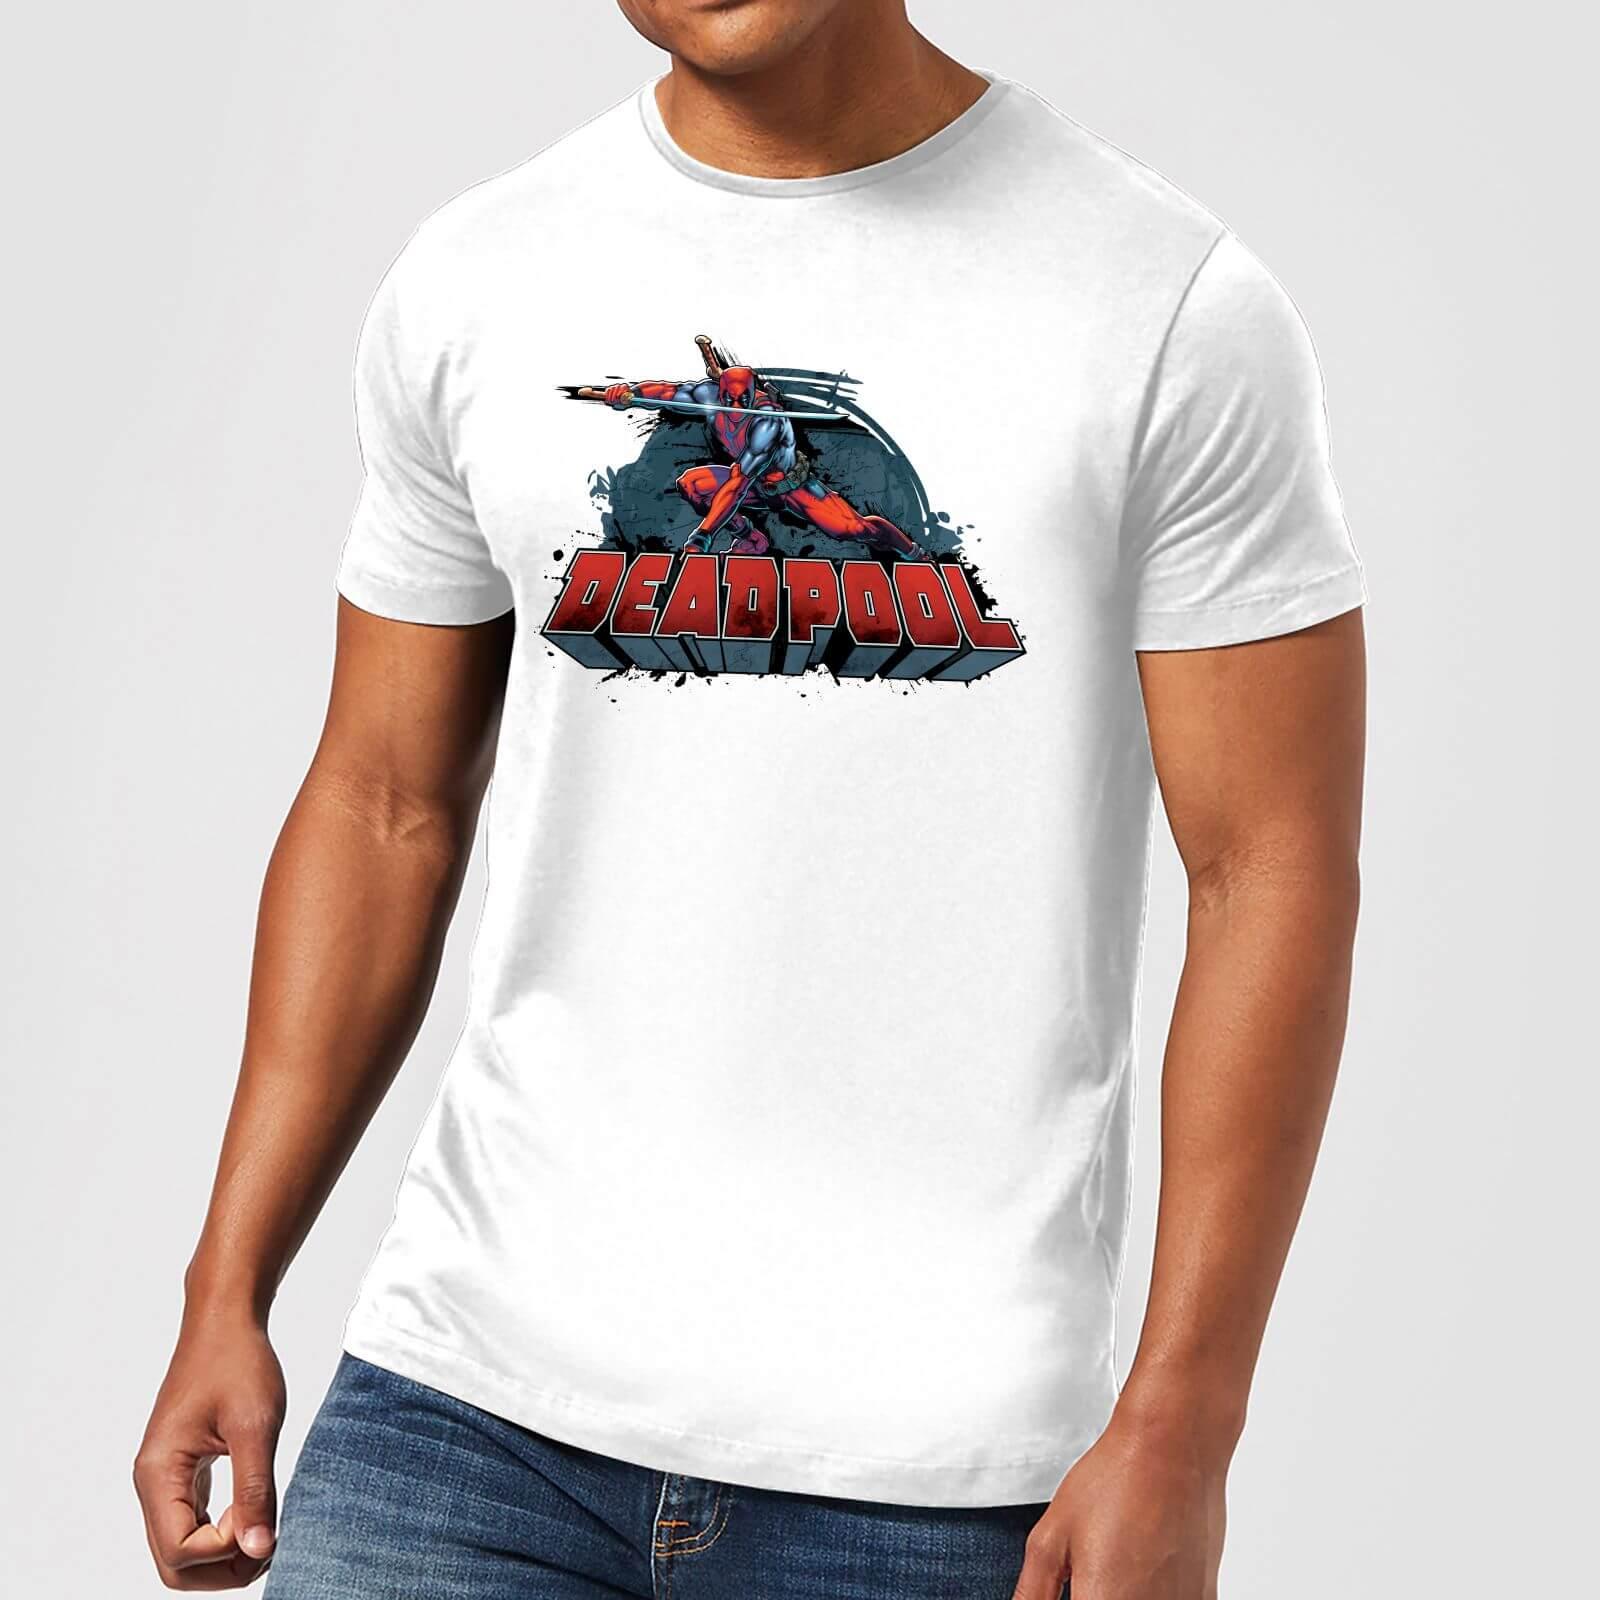 OfferteWeb.click 57-t-shirt-marvel-deadpool-sword-logo-bianco-uomo-xxl